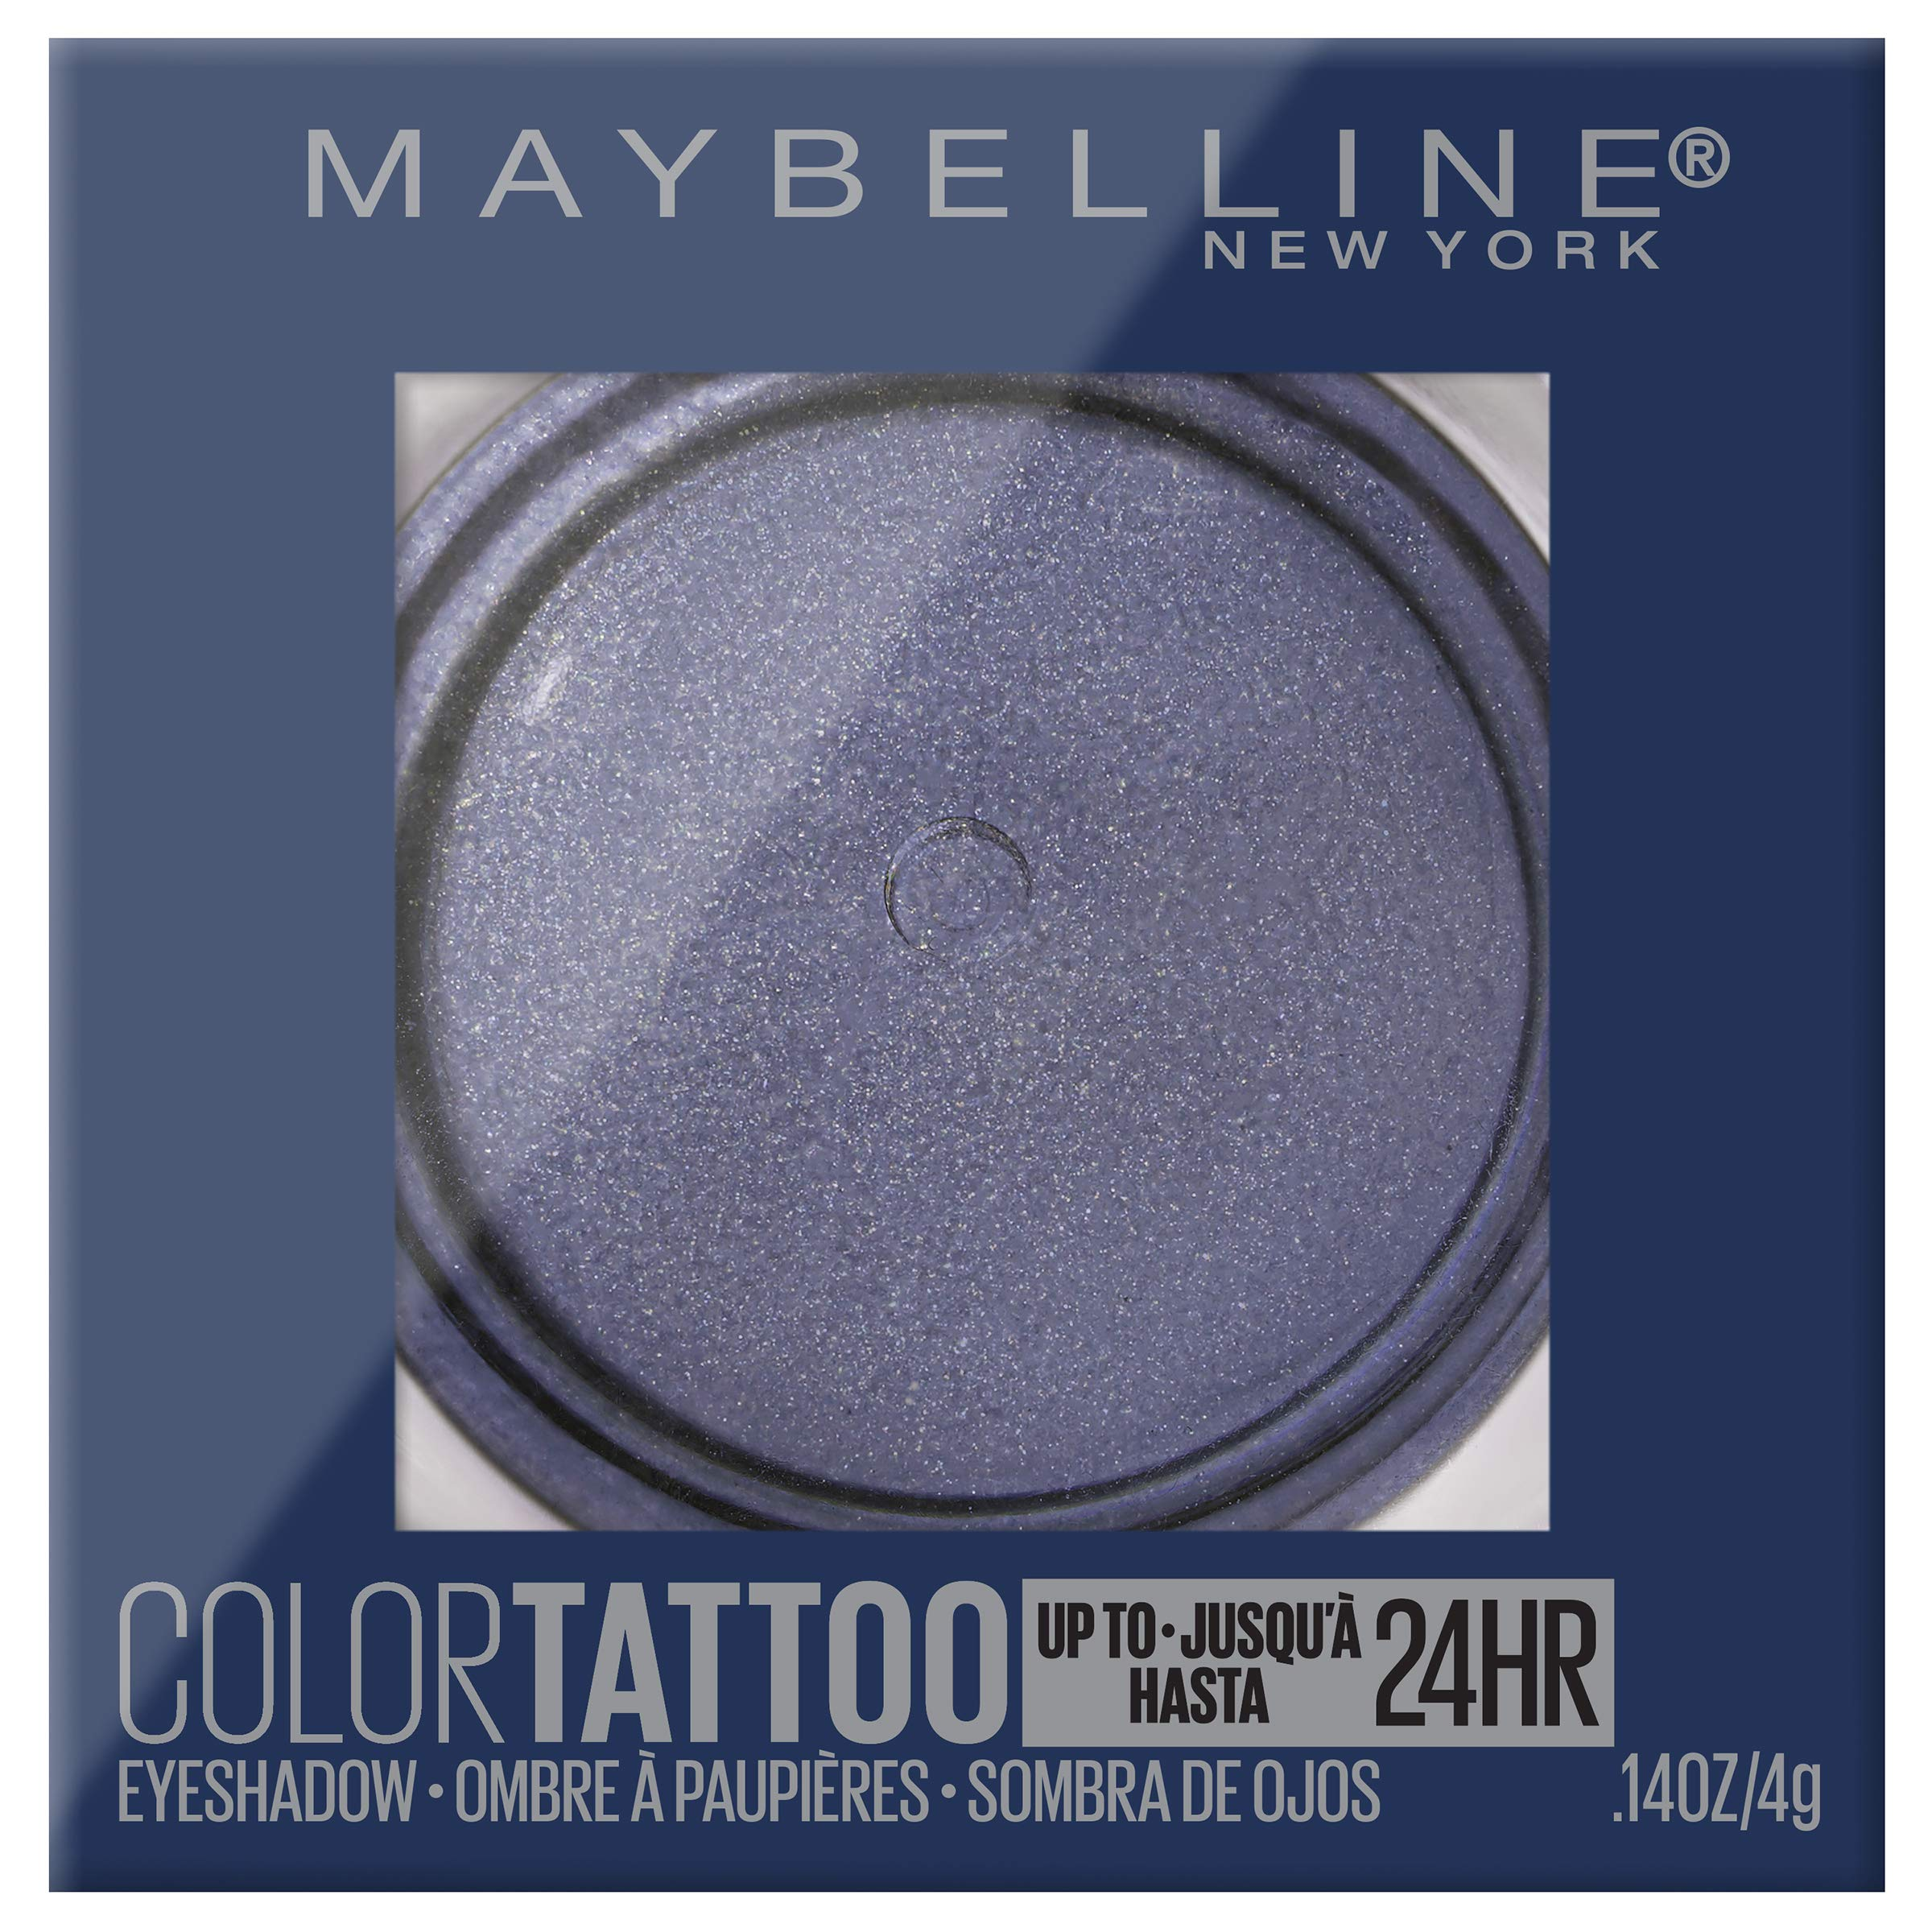 Maybelline New York Color Tattoo 24 Hour Longwear Cream Eyeshadow Makeup, Trailblazer, 0.14 Ounce